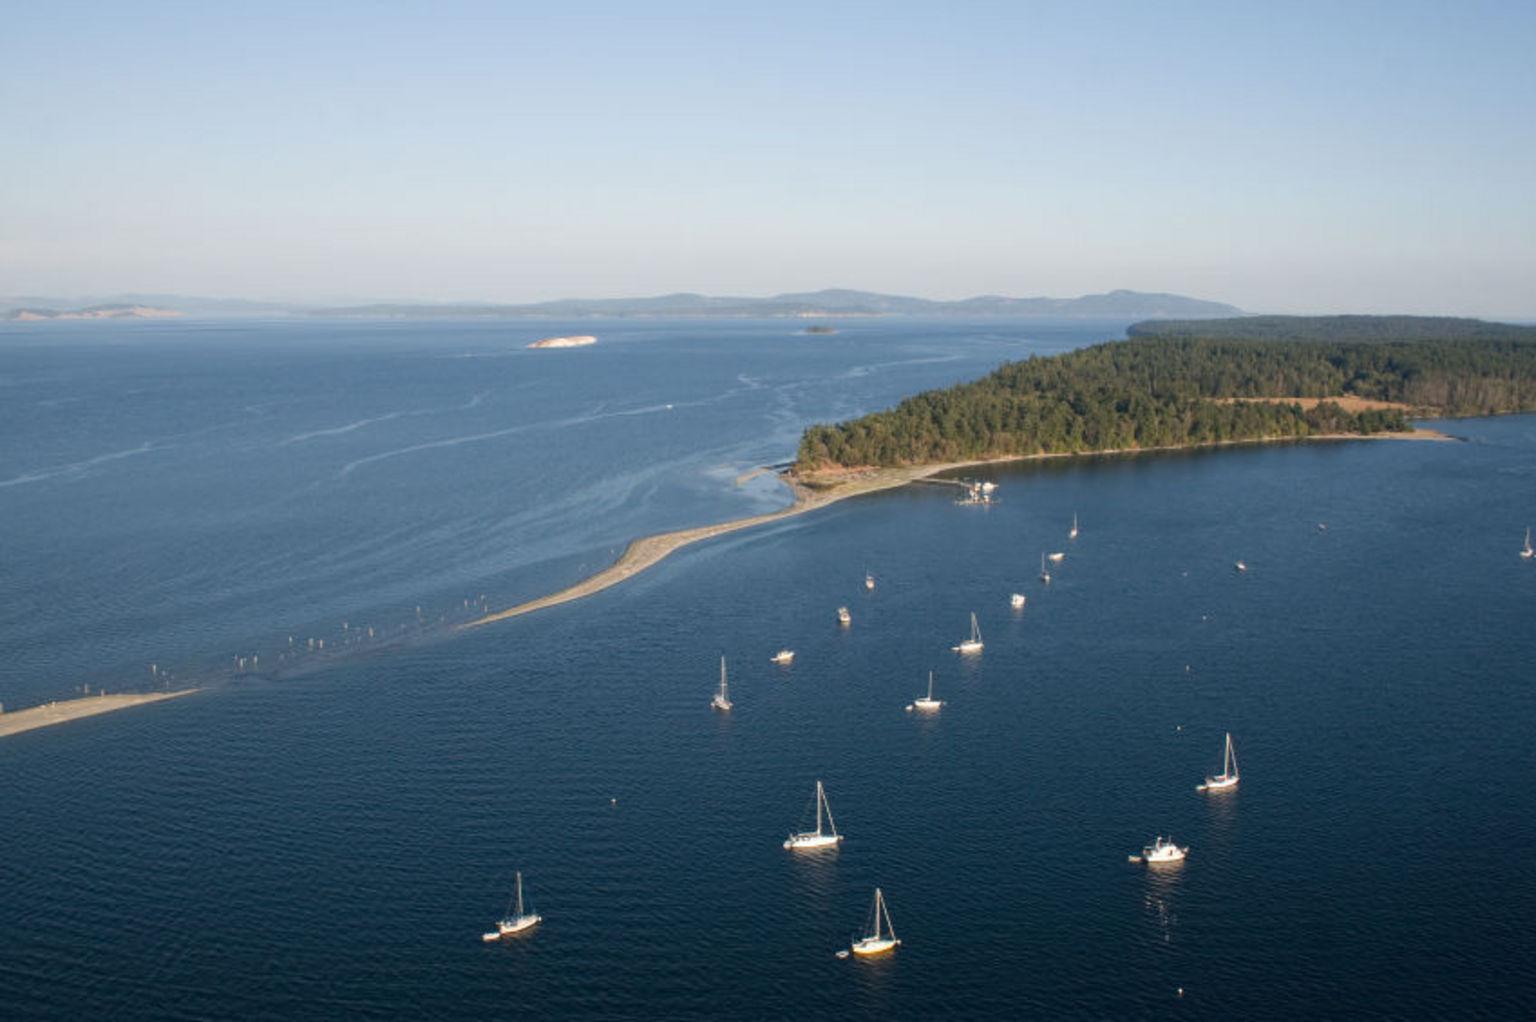 MÁS FOTOS, Victoria Panorama Seaplane Tour